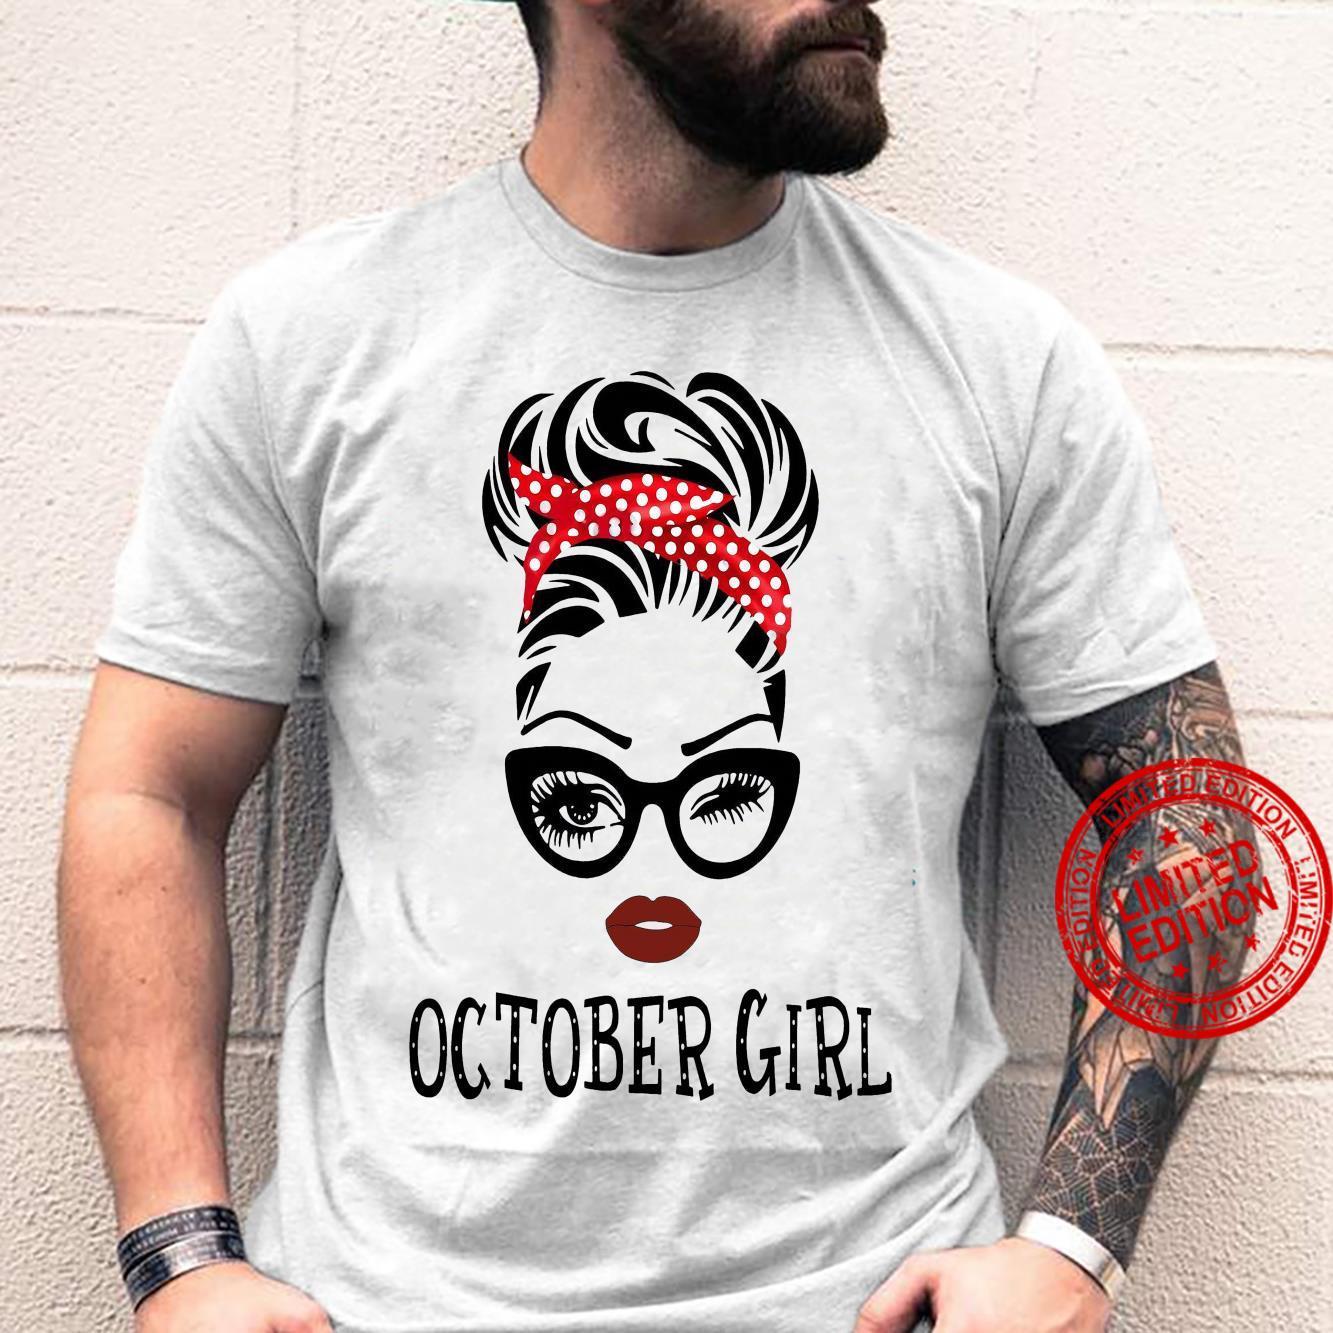 October girl shirt